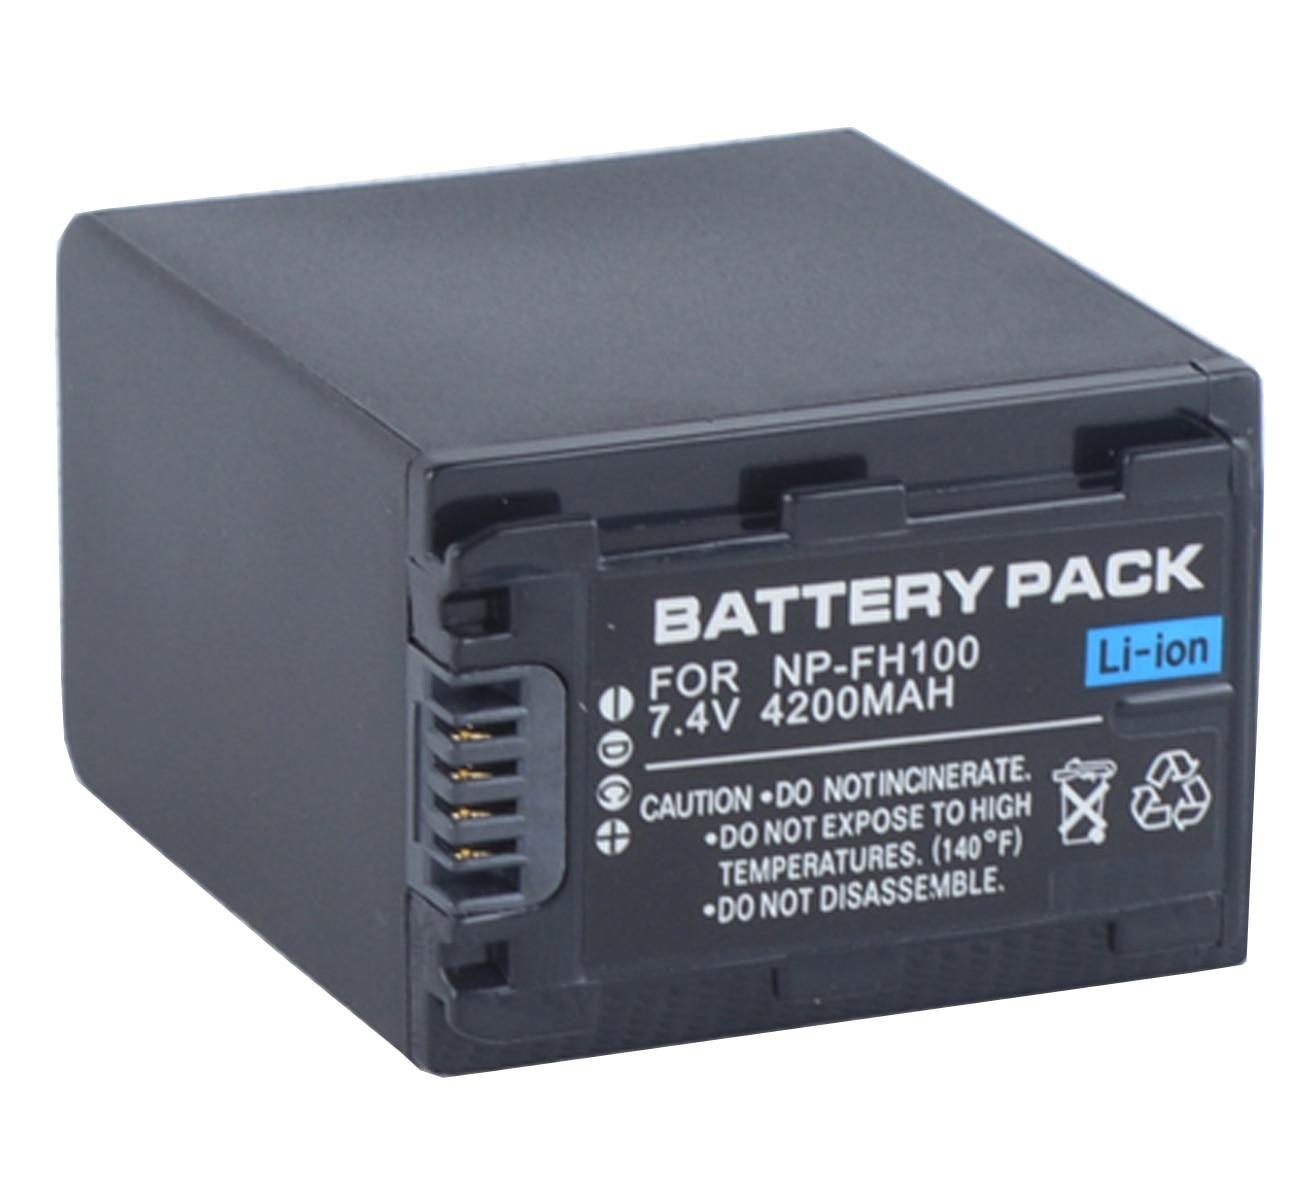 Paquete de baterías para videocámara Sony HDR-HC5, HDR-HC5E, HDR-HC7, HDR-HC7E, HDR-HC9, HC9E MiniDV Handycam